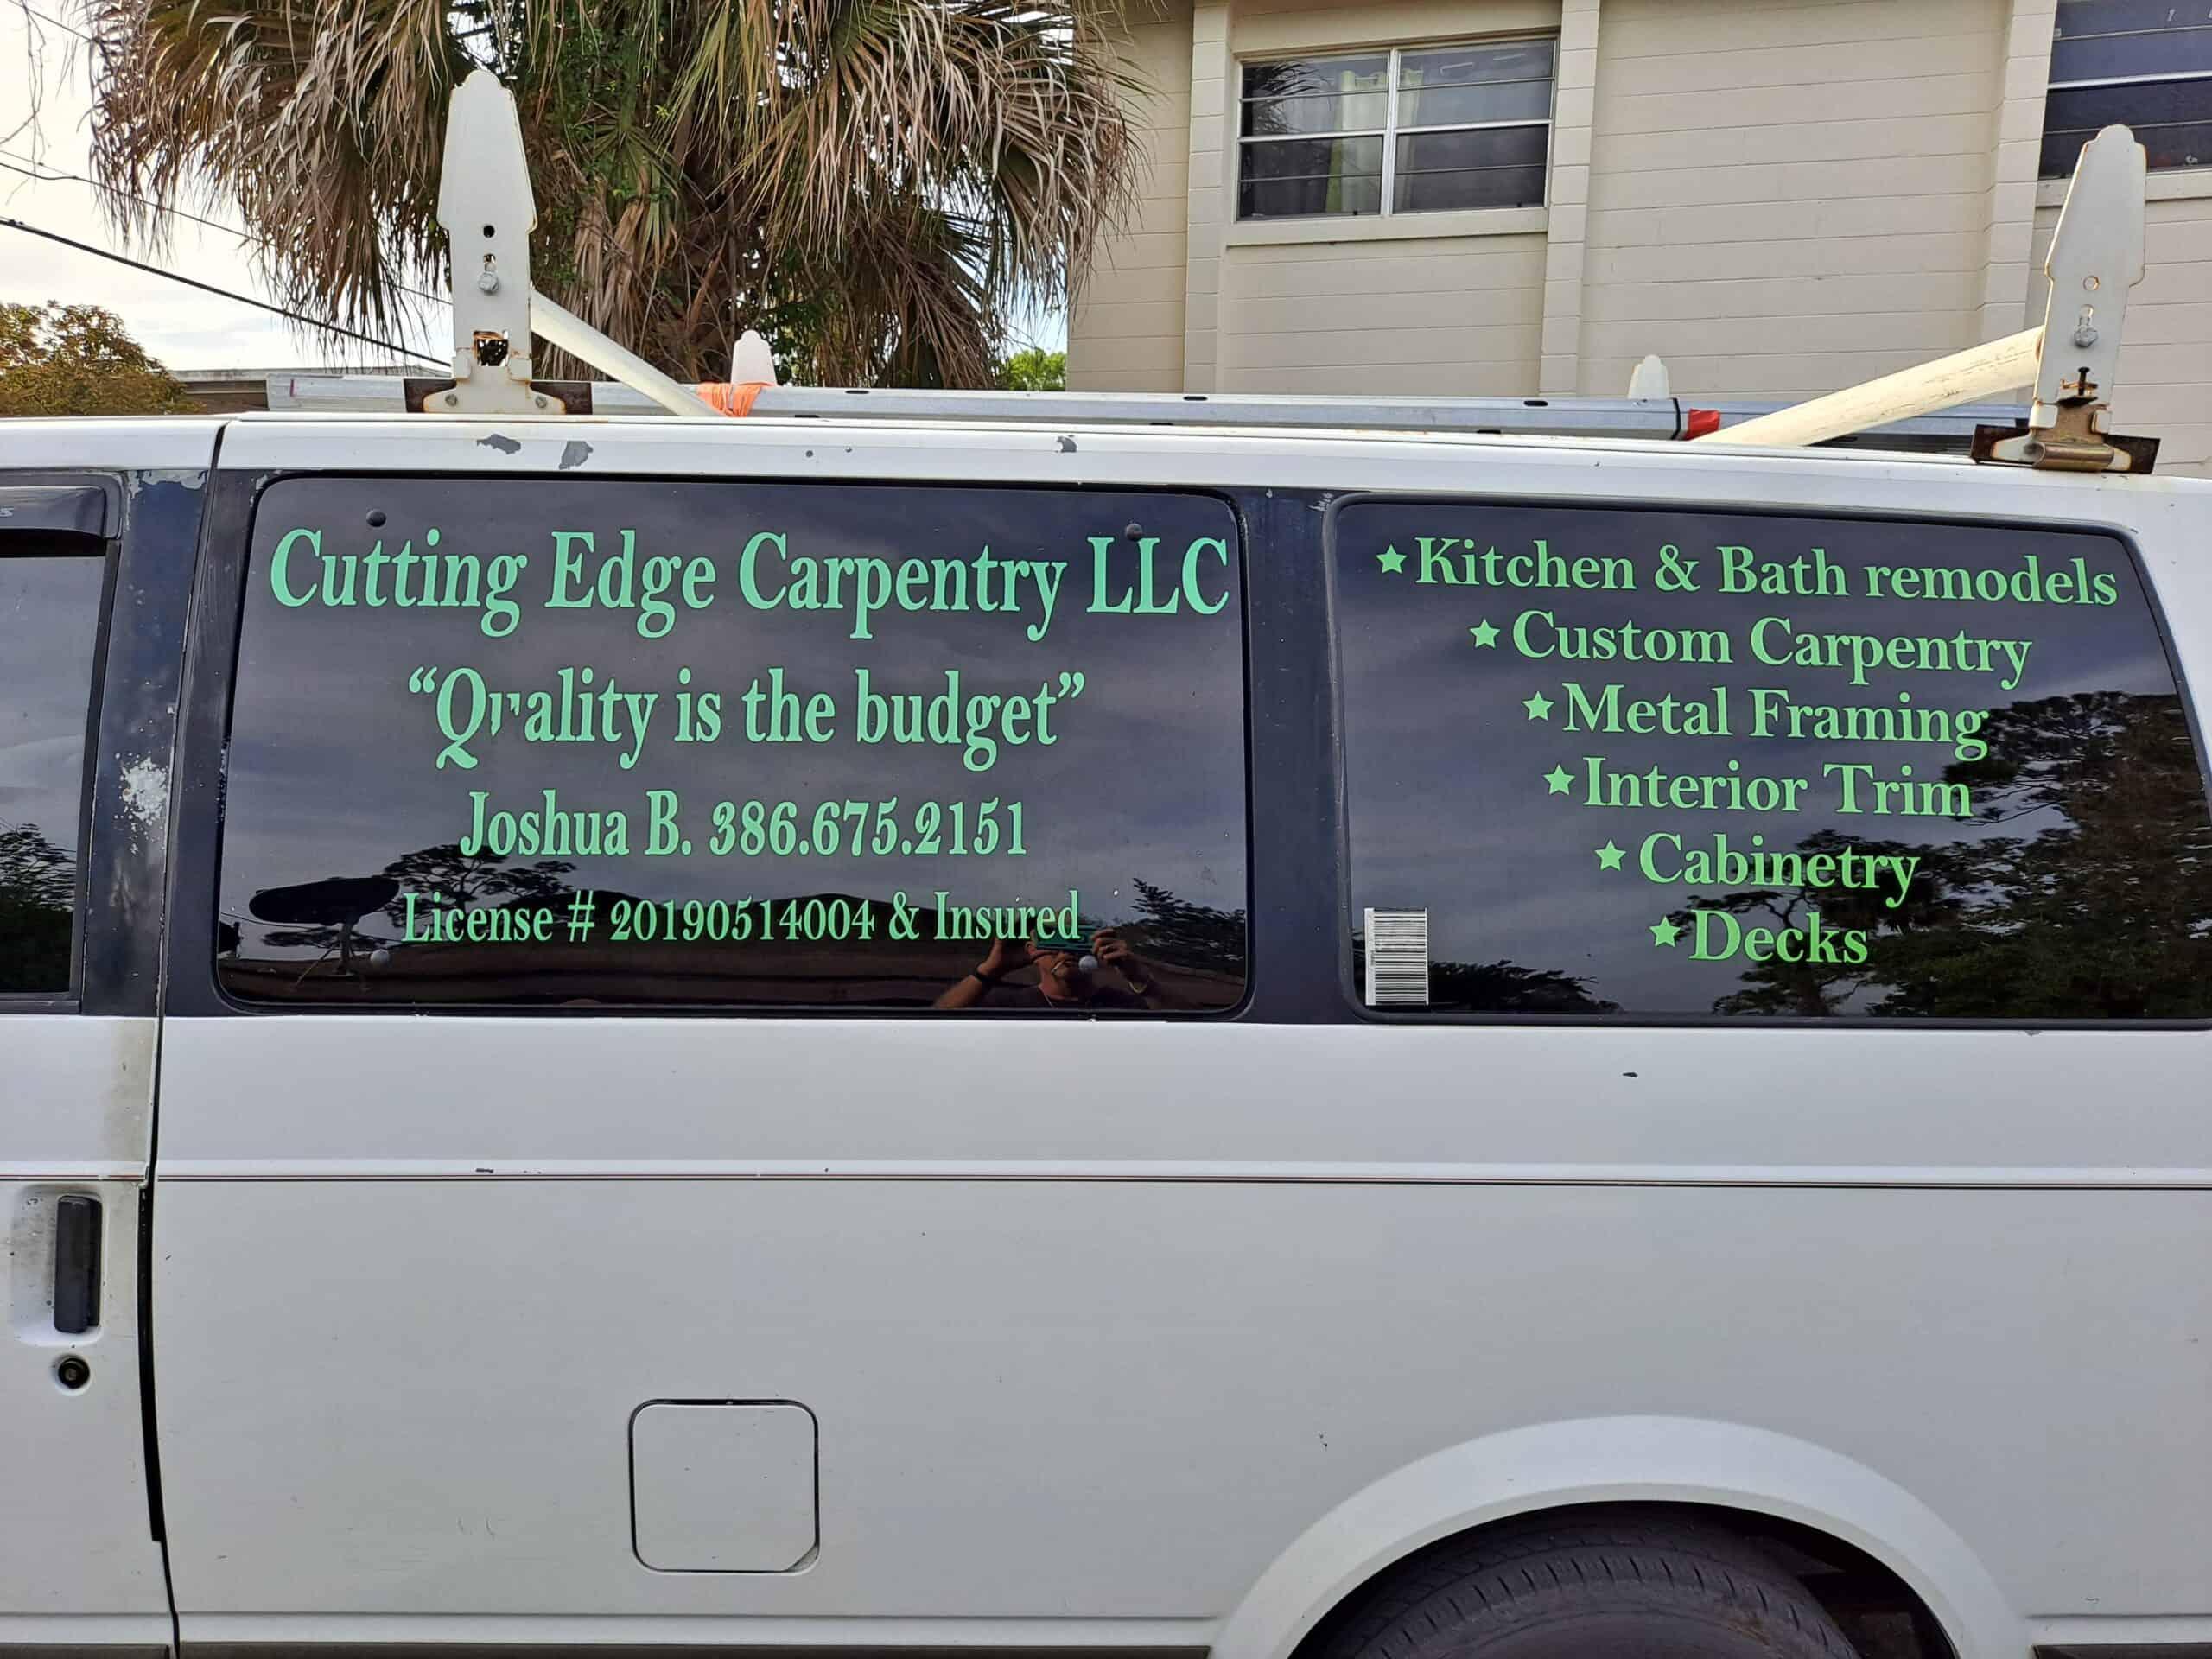 Cutting Edge Carpentry Van